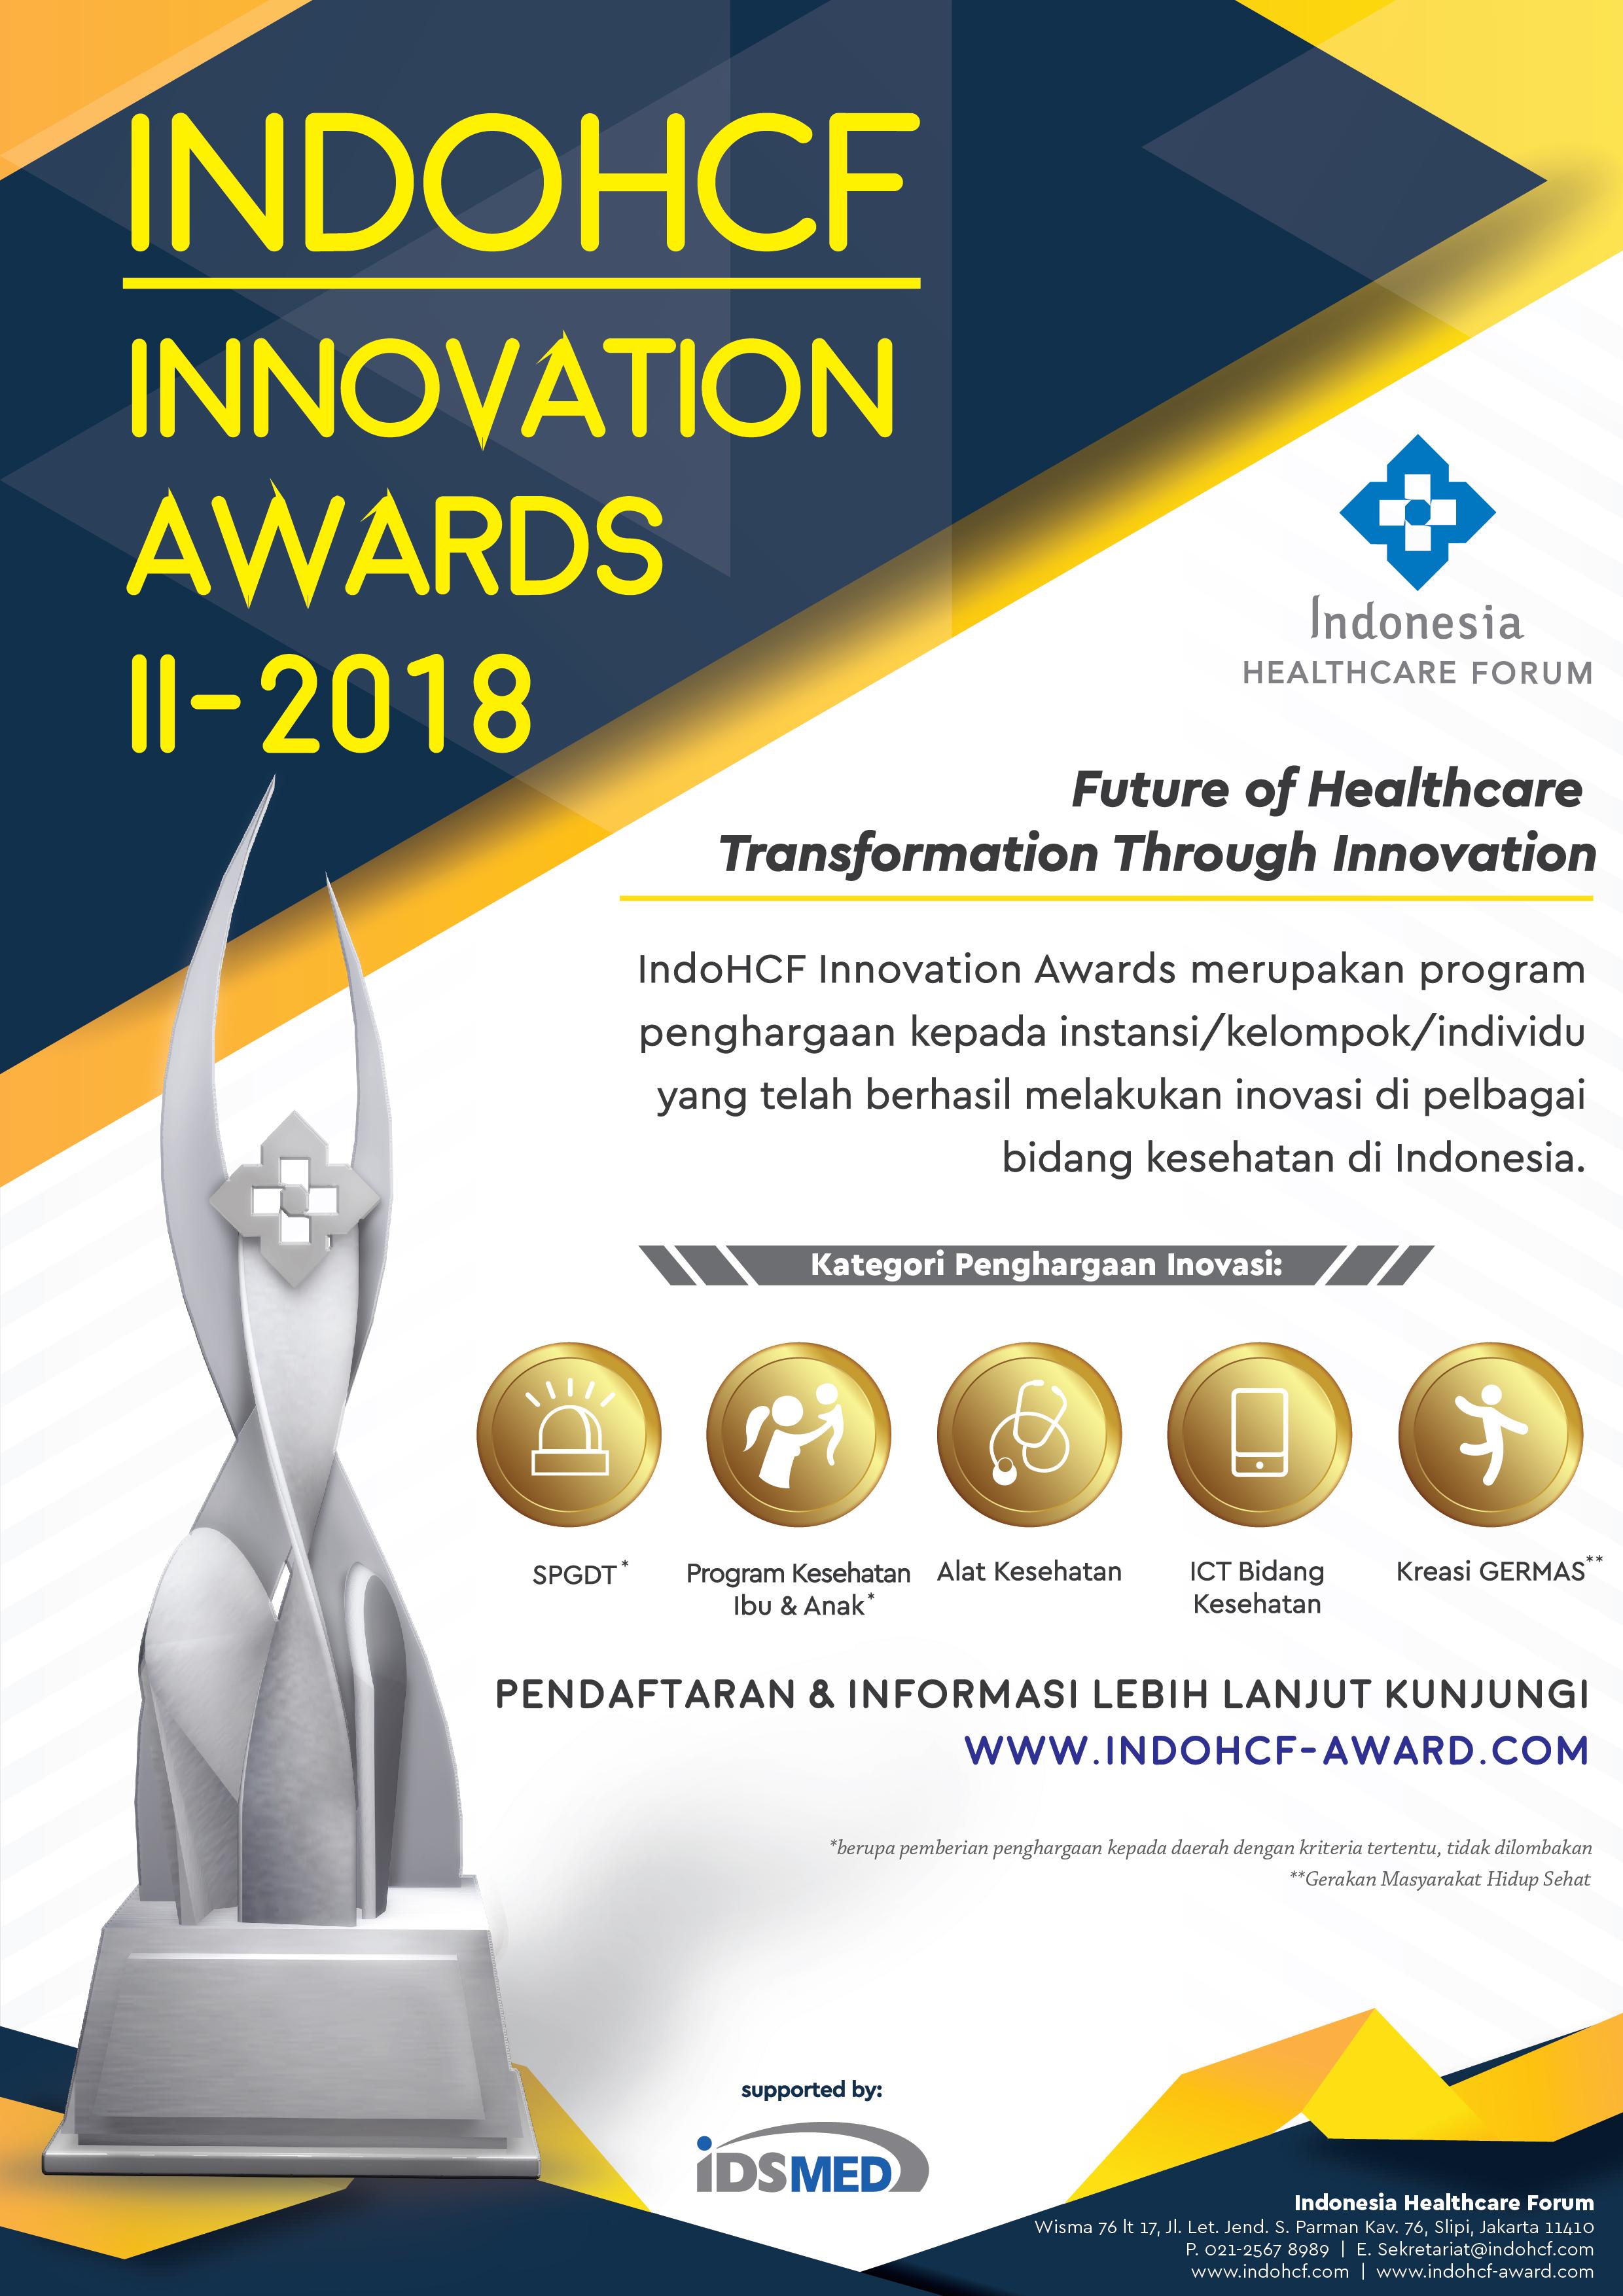 FA Poster IndoHCF Innovation Awards II-2018 20171220